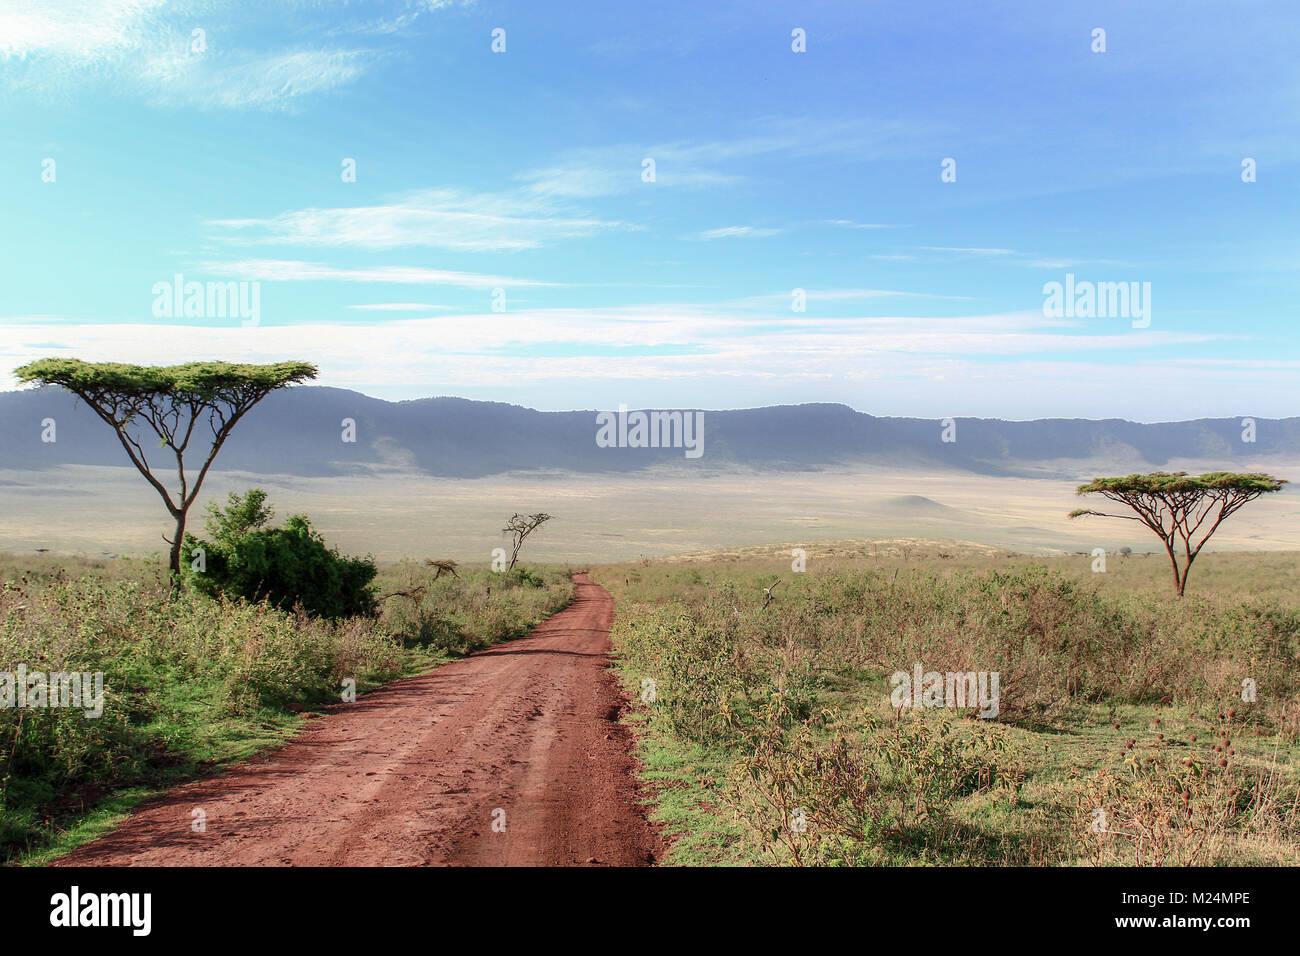 Dirt road between Acacias leading to Ngorongoro Crater, Tanzania - Stock Image